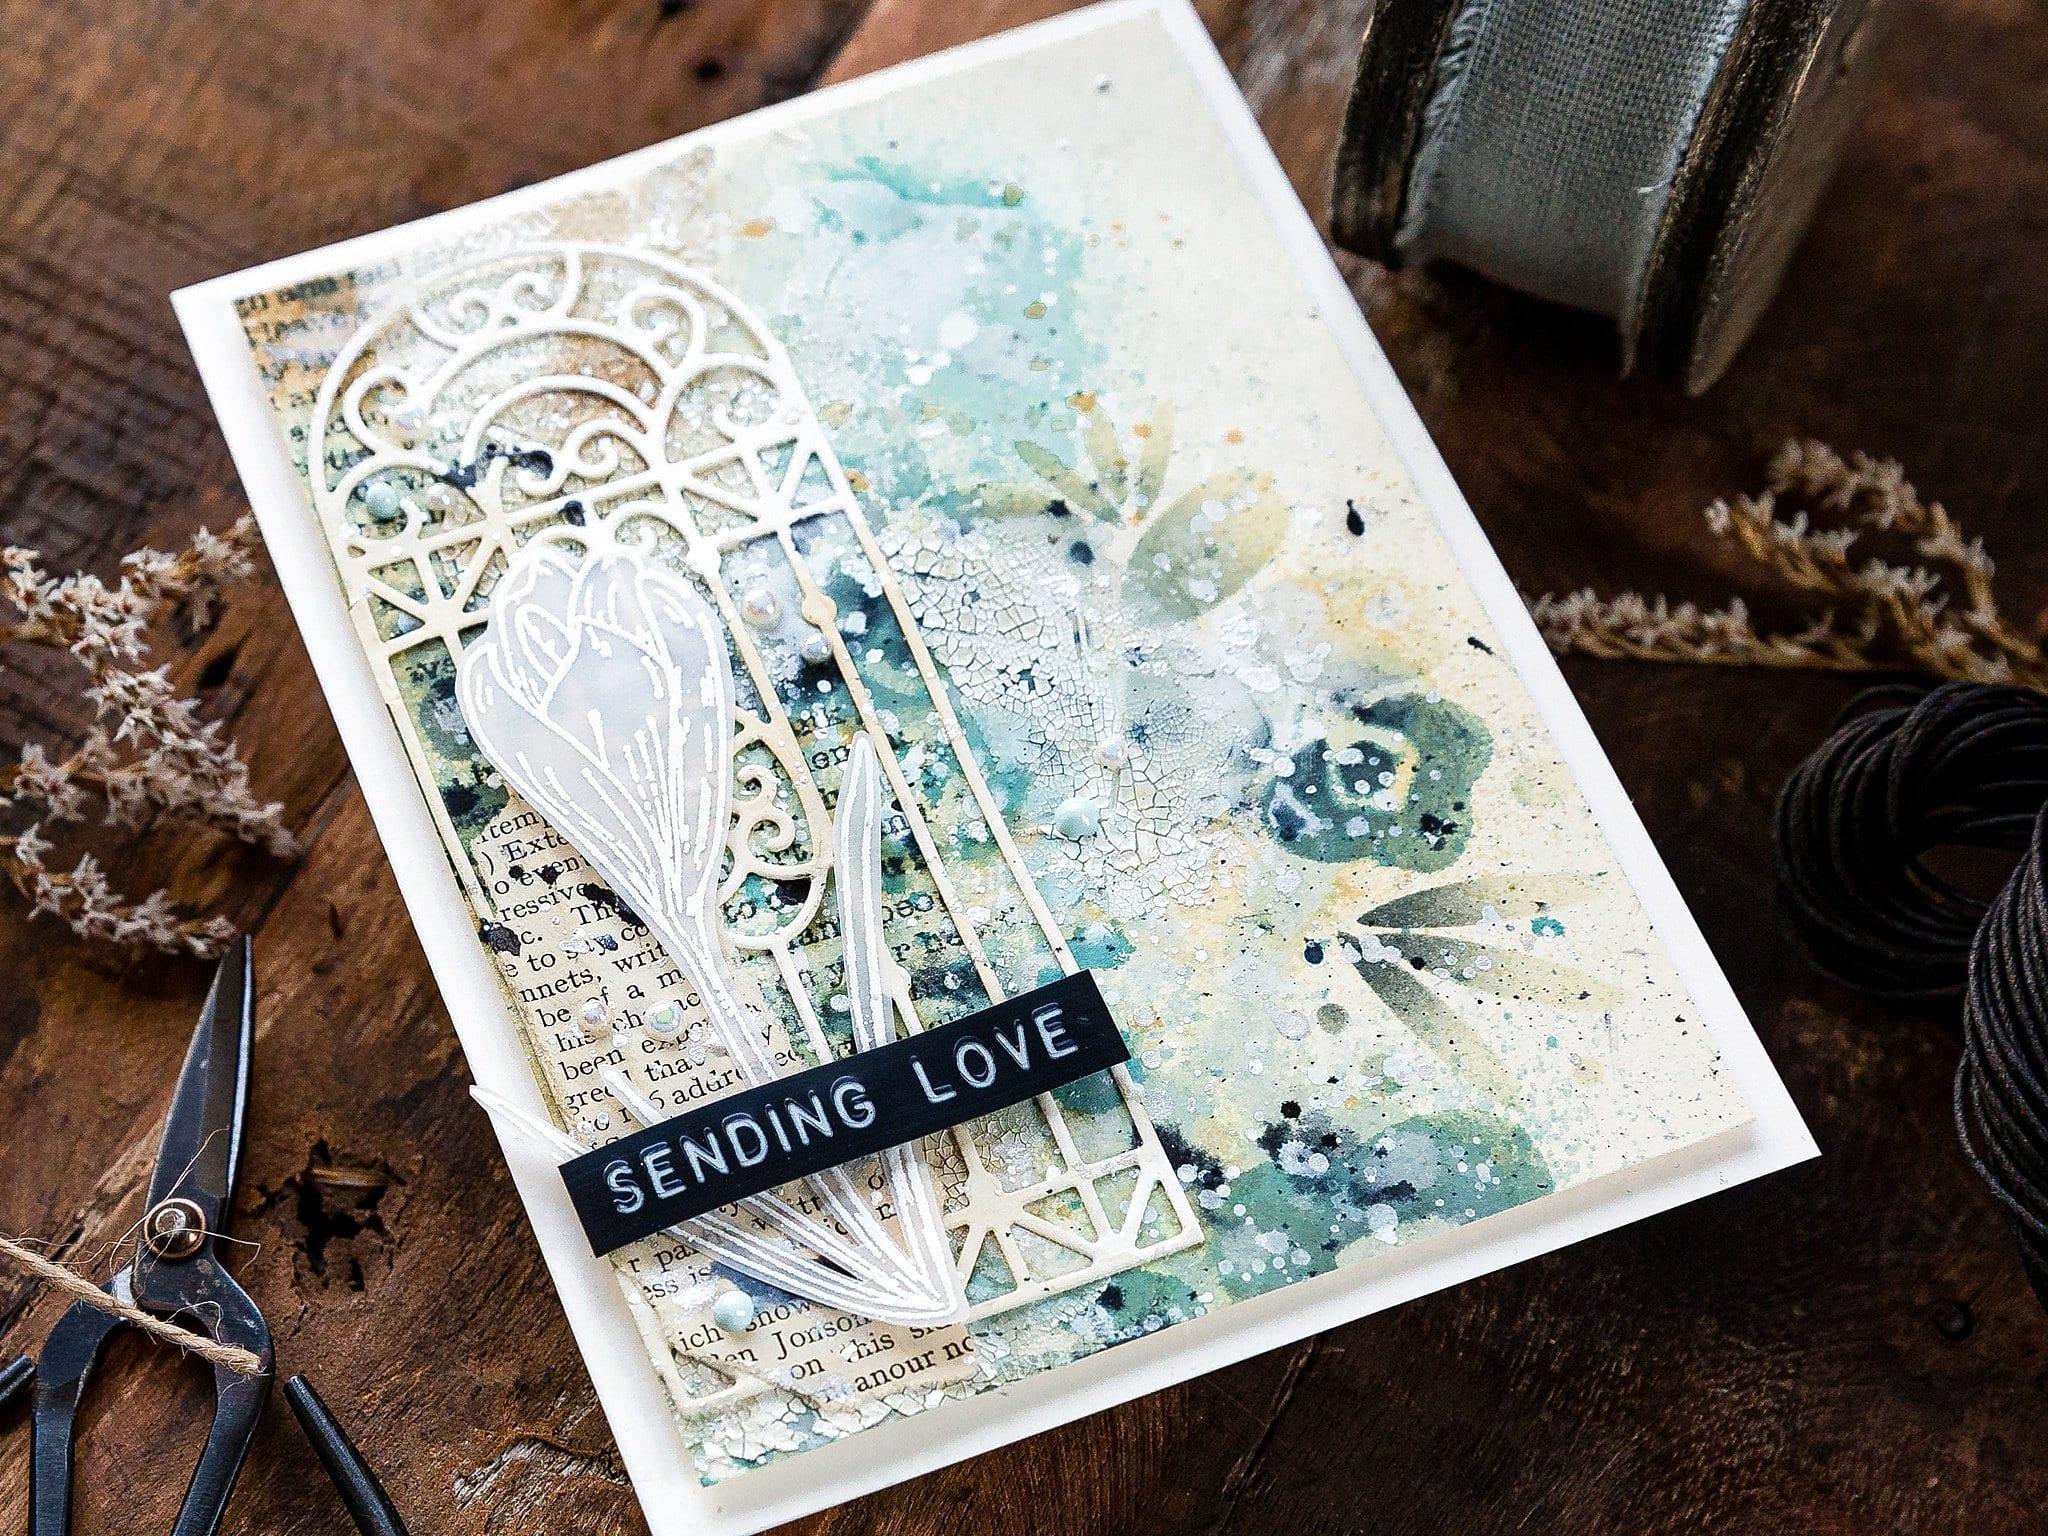 Video tutorial - mixed media card by Debby Hughes, mistakes and all! #debbyhughes #limedoodledesign #handmadecards #cardmaking #cardmakingideas #cardmakingtechniques  #cardmakingtutorials #handmadecardideas #simonsaysstamp #timholtz #distress #mixedmedia